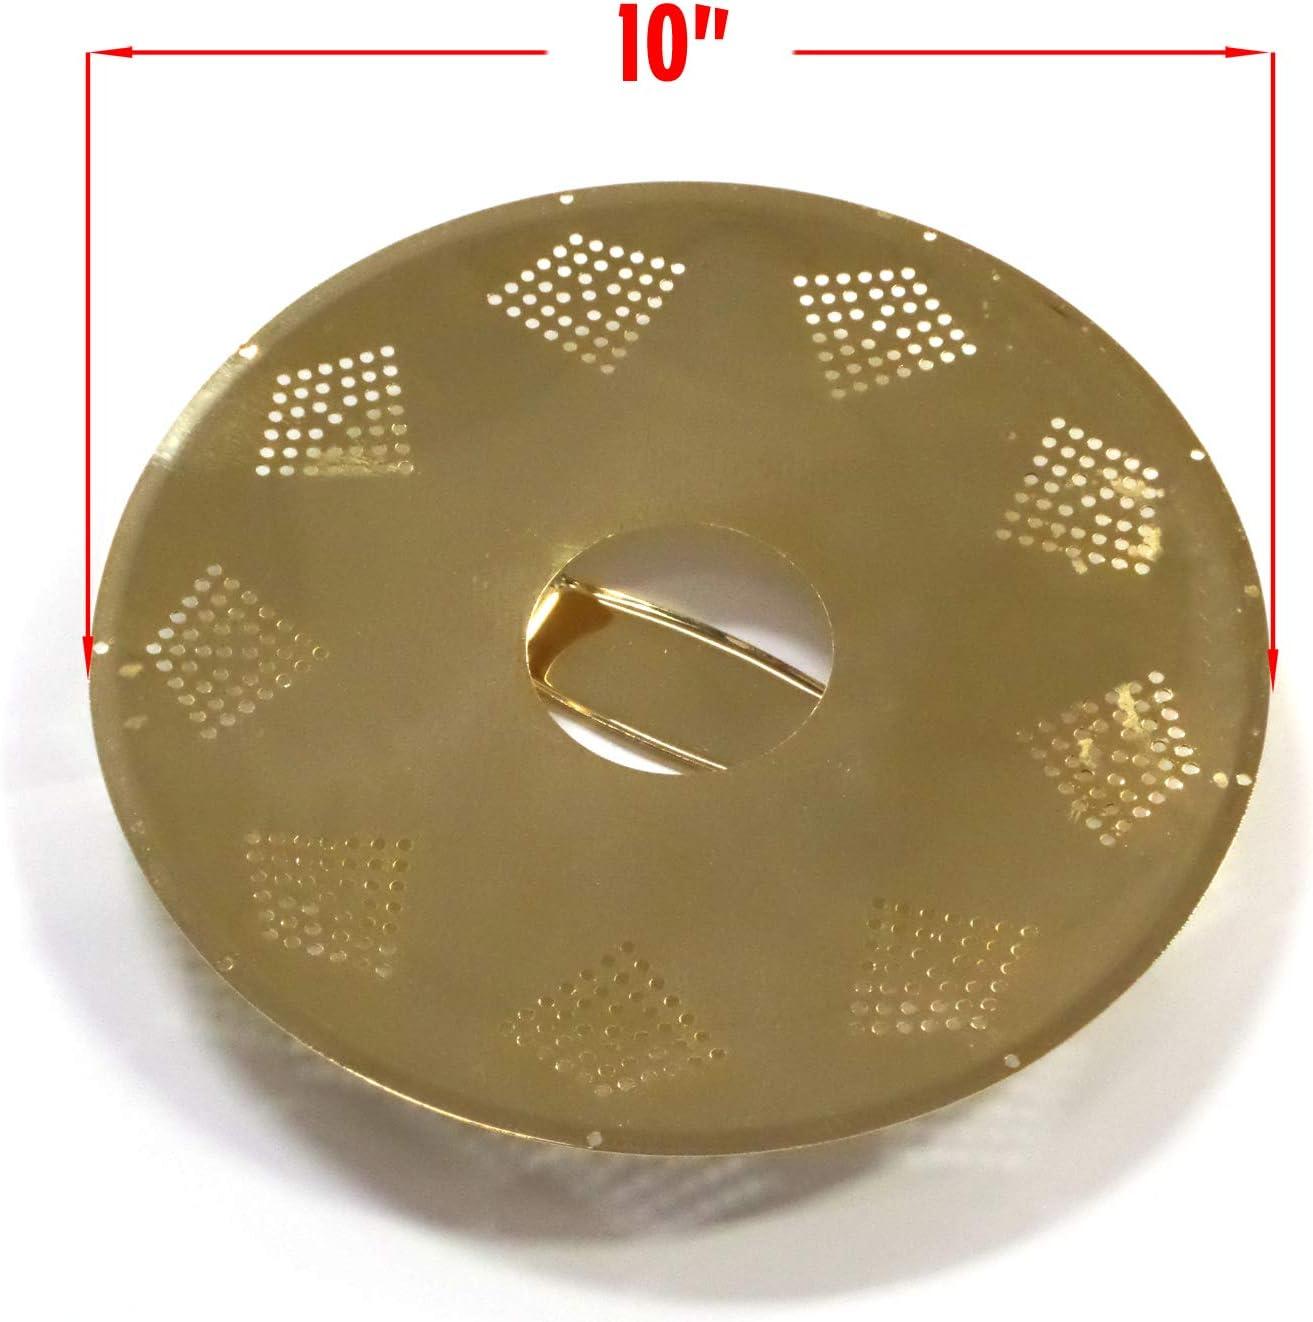 Kay 10 Brass Replacement 6 String Perforated Diamond Pattern RP10B Upgrade Resonator Plate